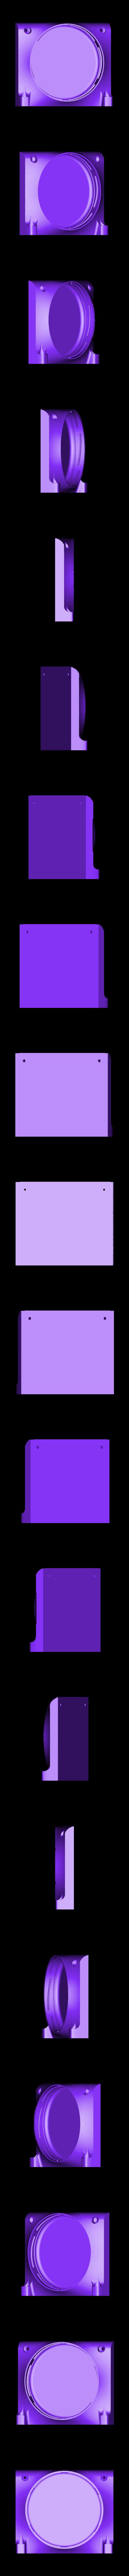 porte pot1.2.stl Télécharger fichier STL gratuit Hanging jar holder • Design à imprimer en 3D, Barbe_Iturique